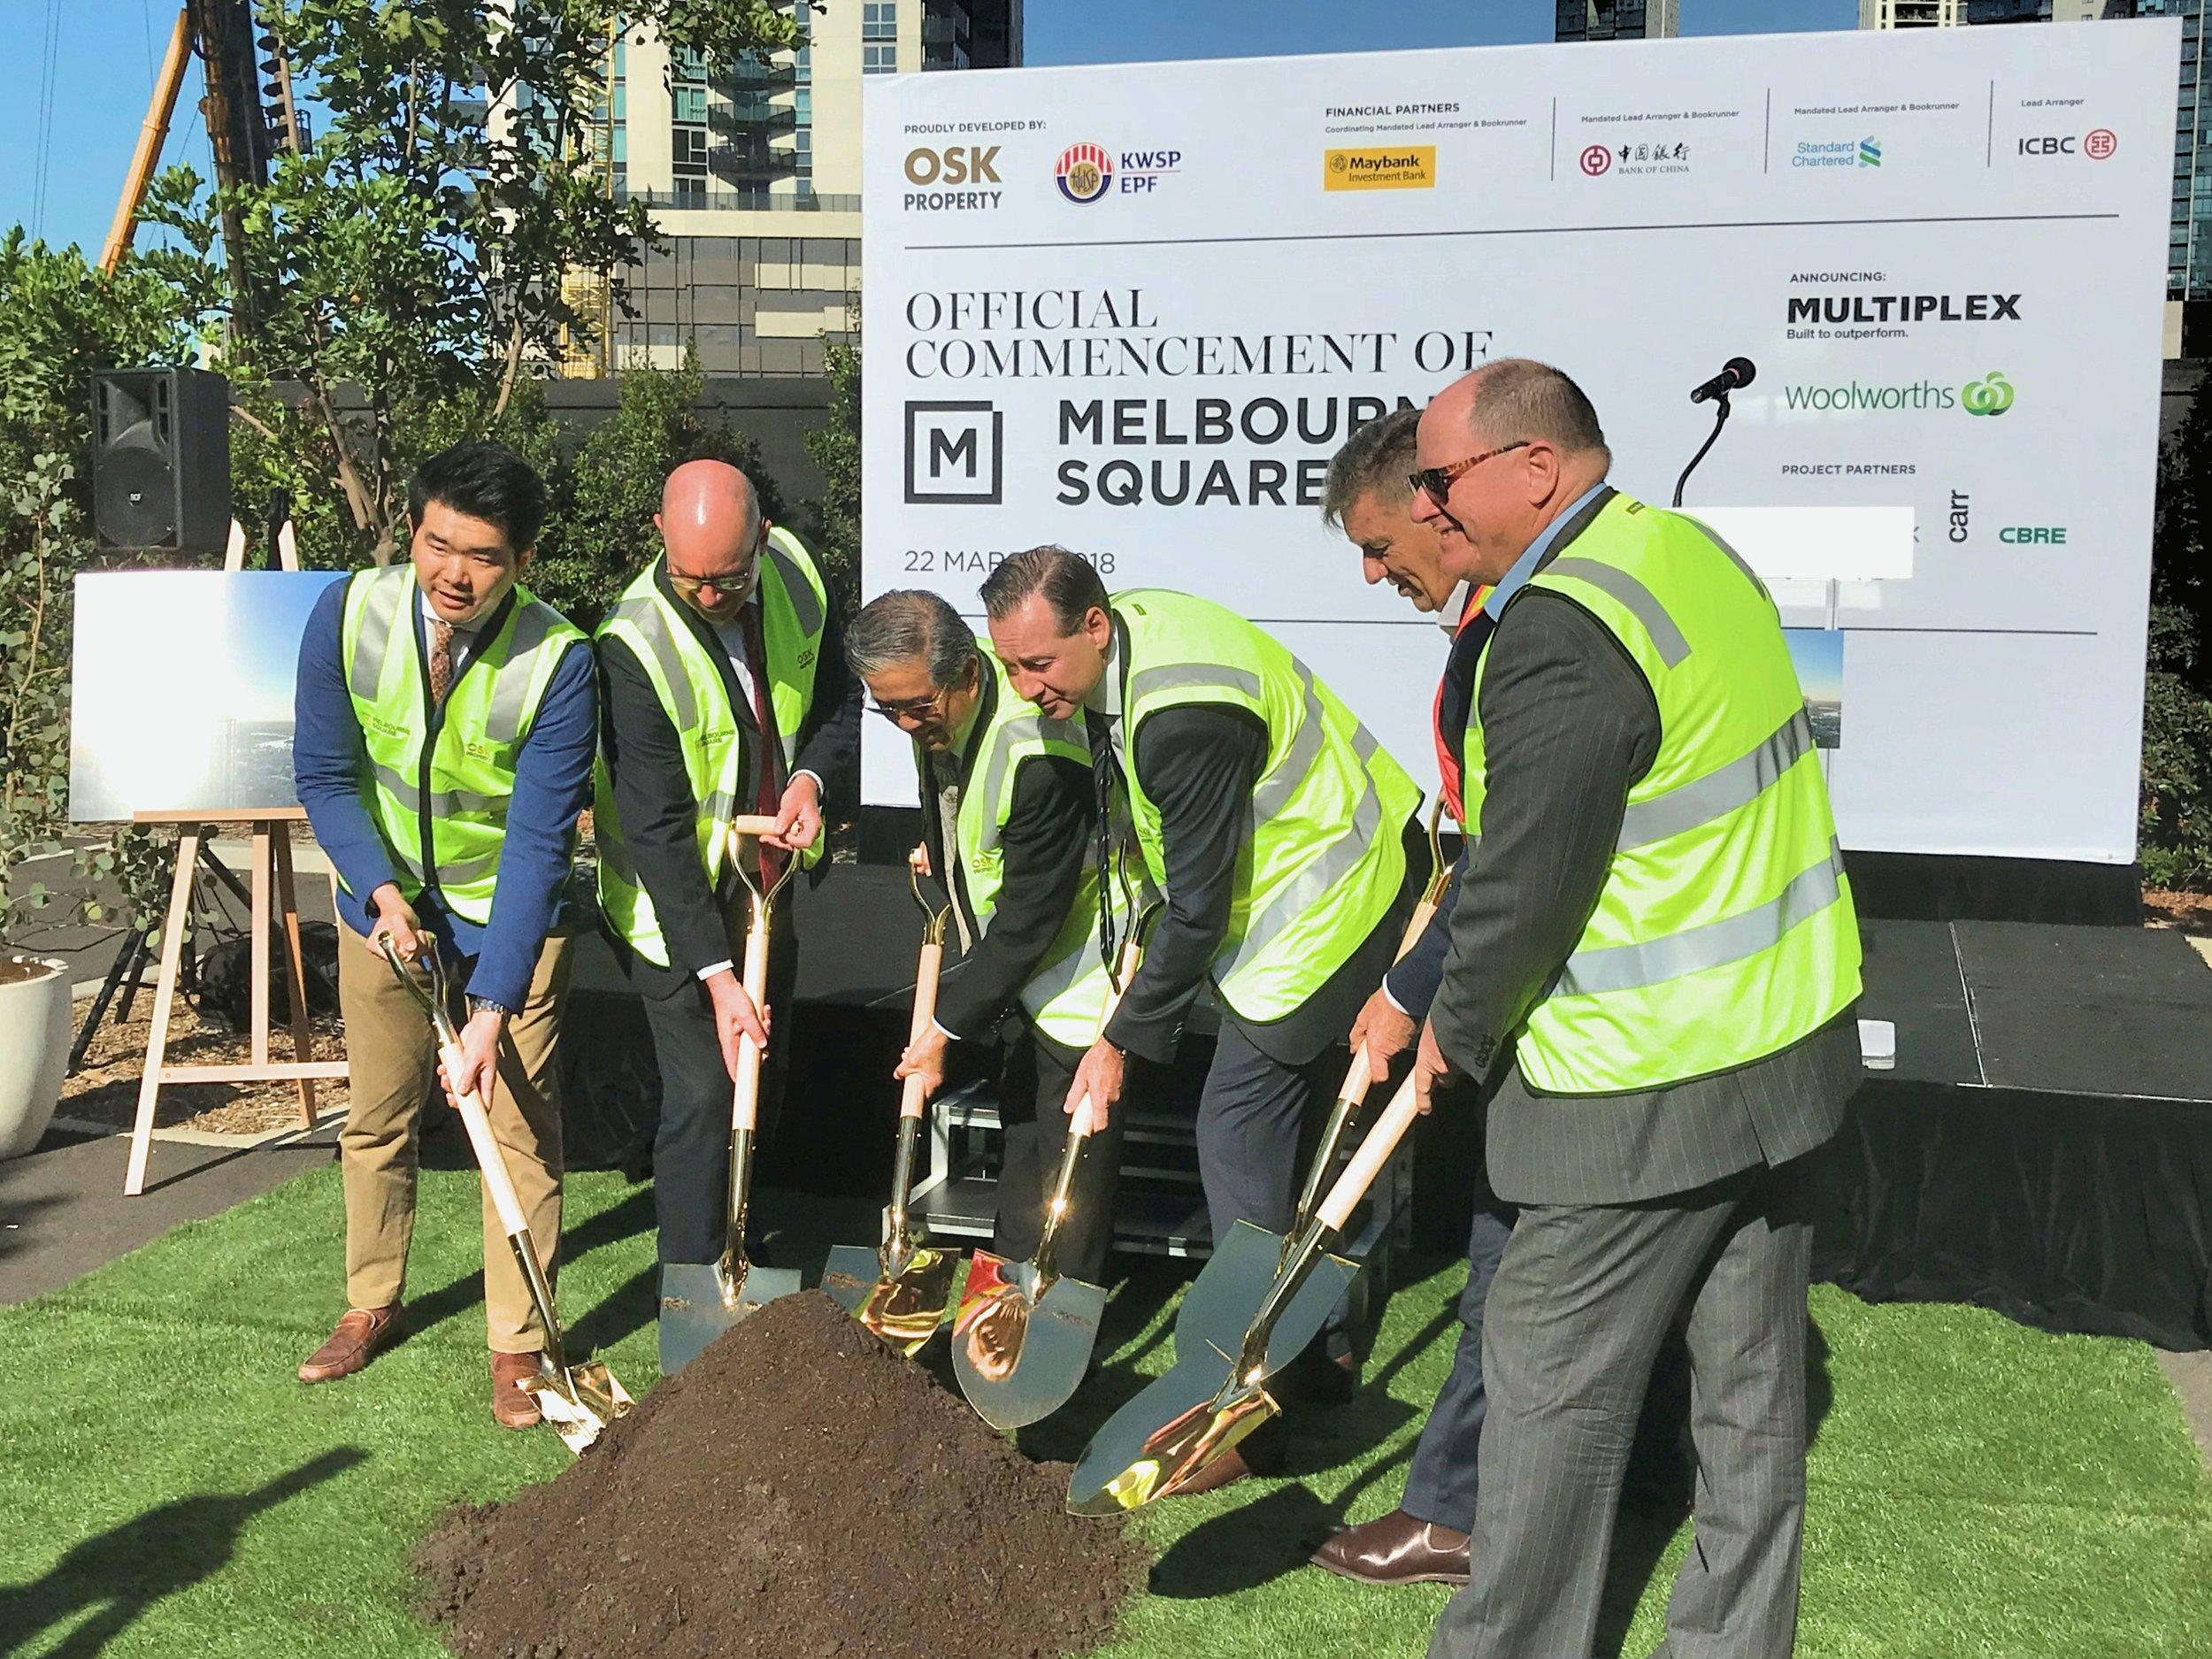 L-R:  Ong Ju Xing ( OSK Property ), Tim Macmillan ( Woolworths ), Tan Sri Ong ( OSK Property ), Michael Longmire ( OSK Property ), Graham Milford-Cottam ( Multiplex ), Ian Sutter ( Cox Architecture )